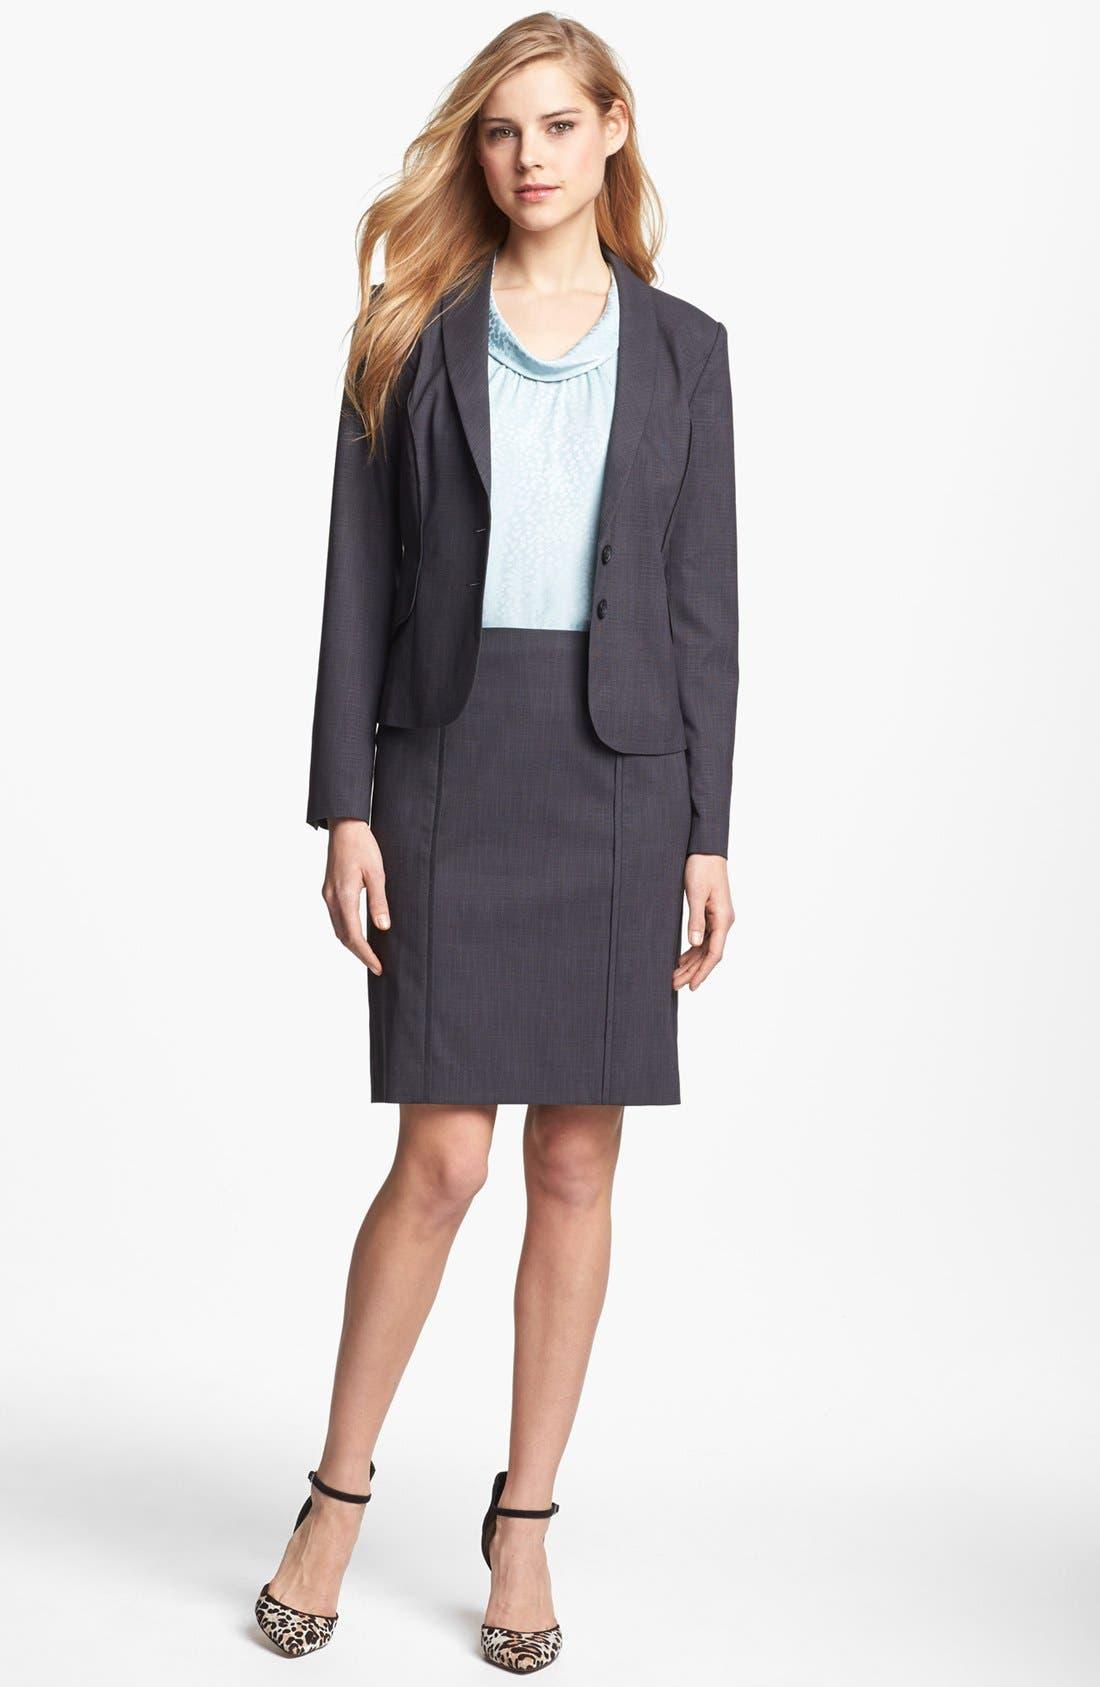 Alternate Image 1 Selected - Halogen® Etched Plaid Suit Jacket